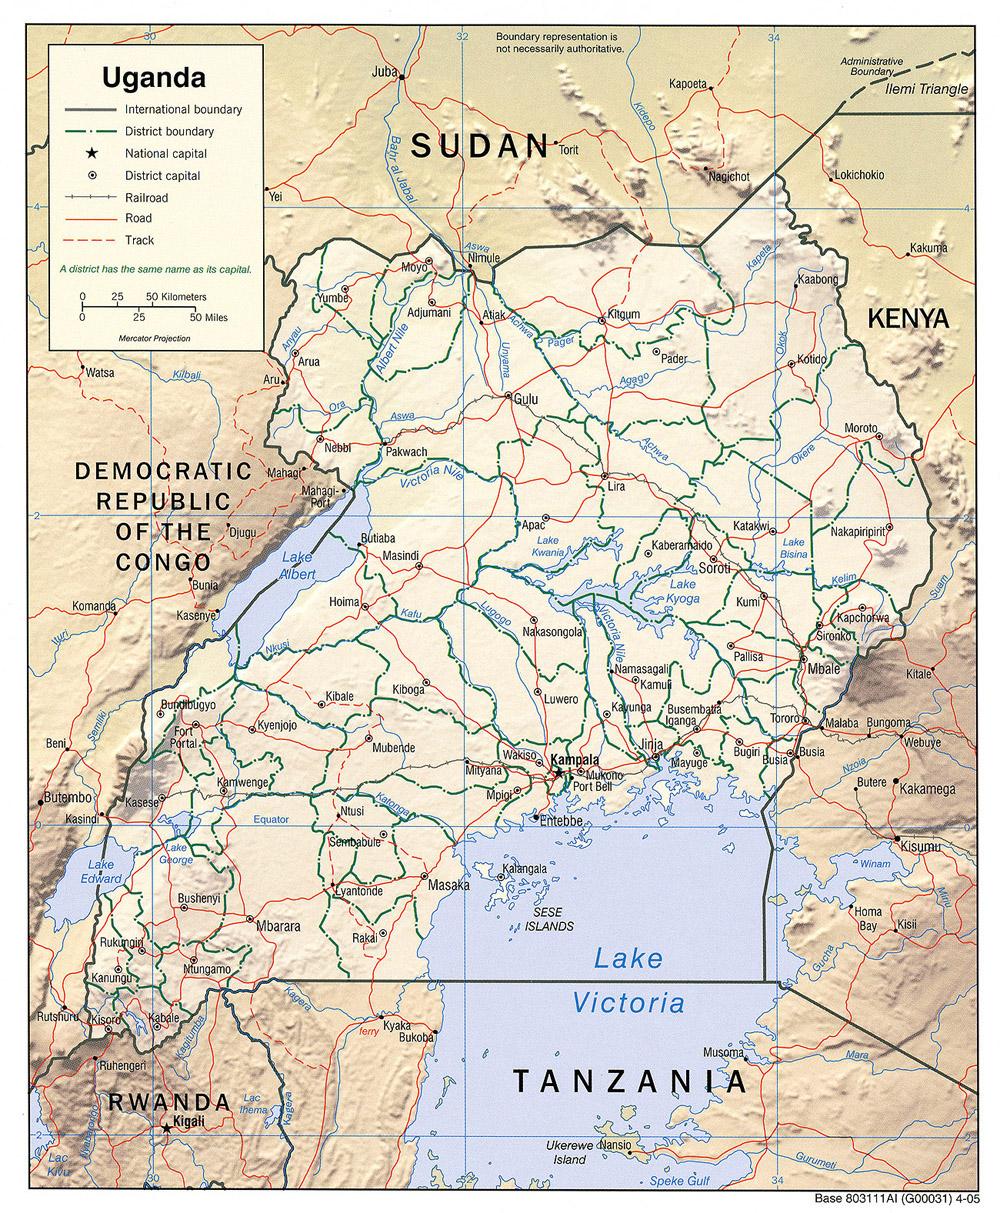 Detailed relief and administrative map of Uganda Uganda detailed